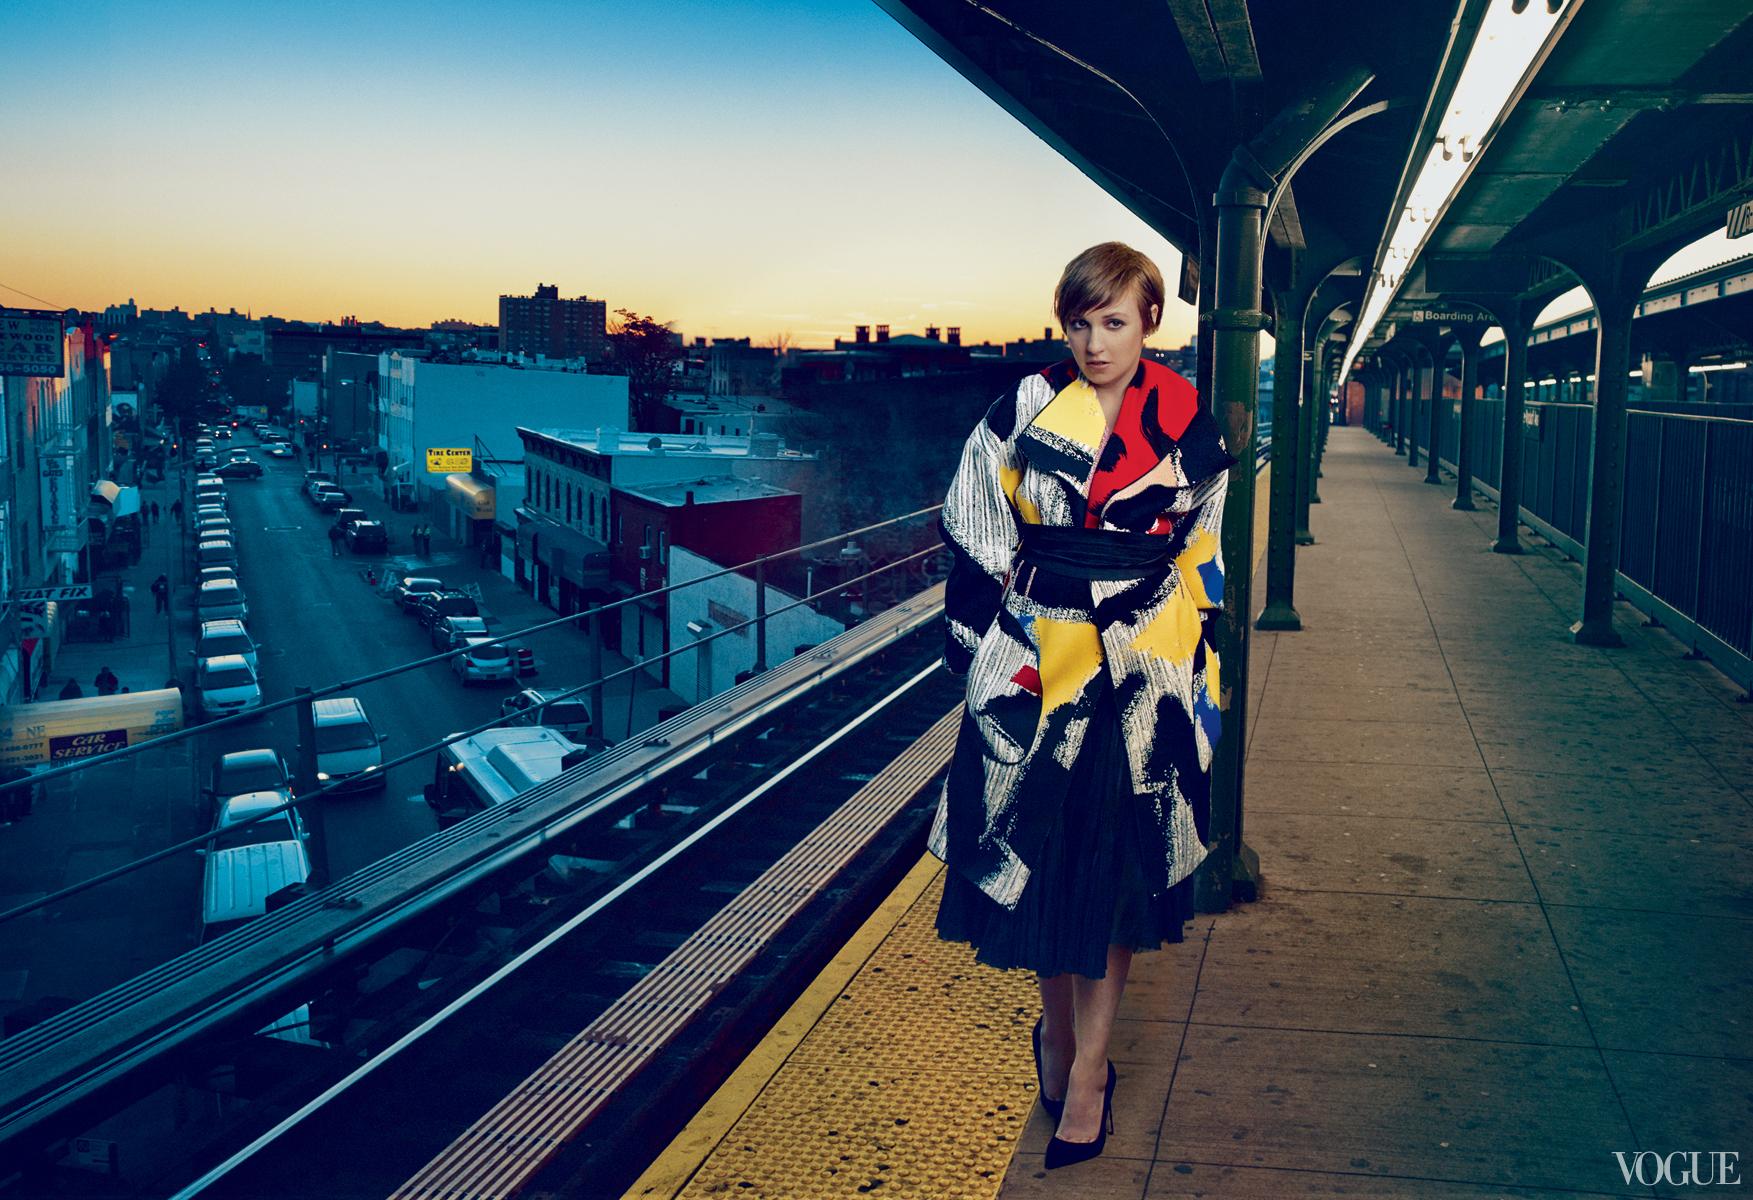 Vogue February 2014 - Christy Rilling Studio belt